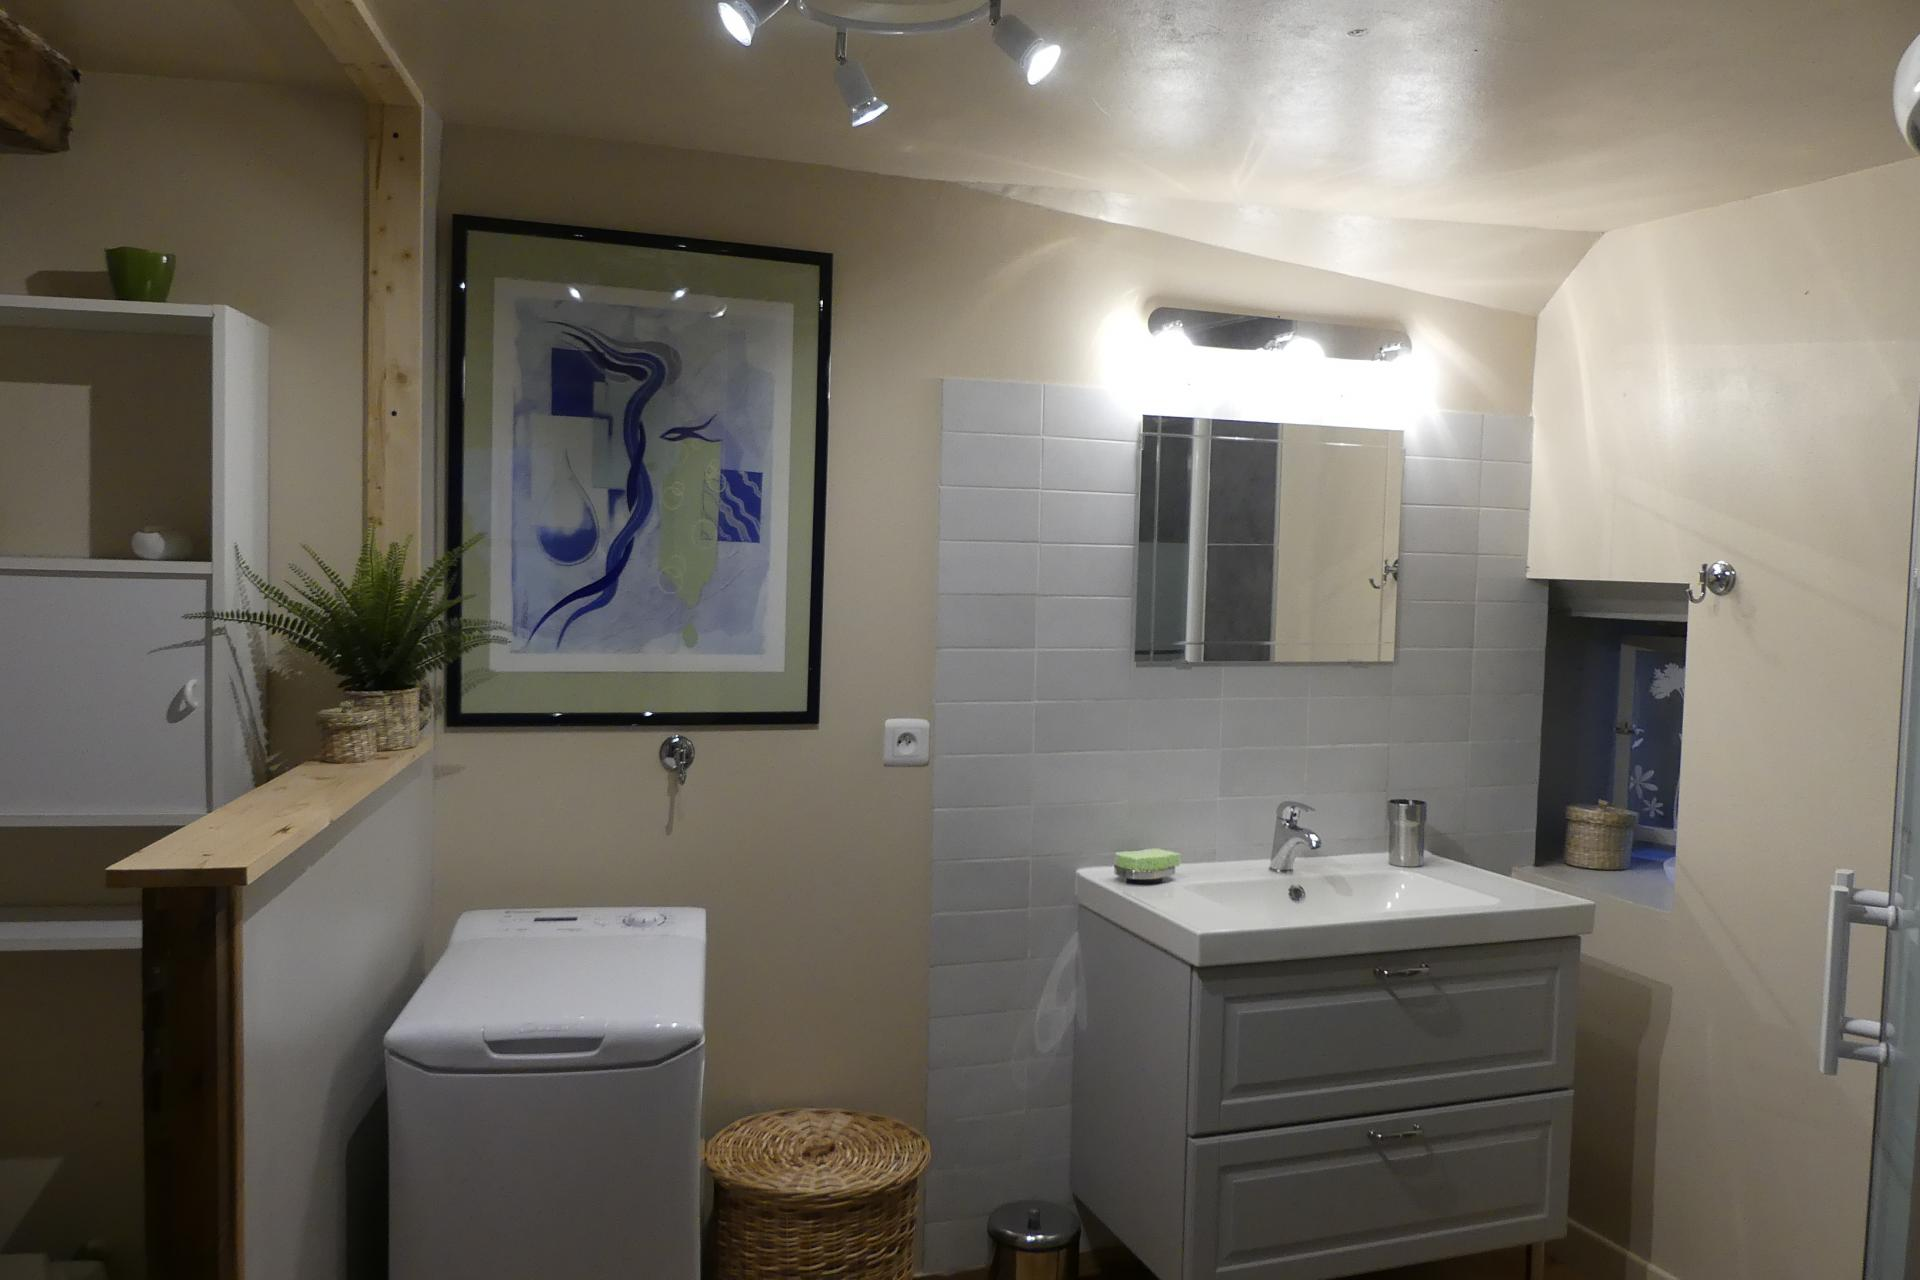 Aperçu de la salle de bain